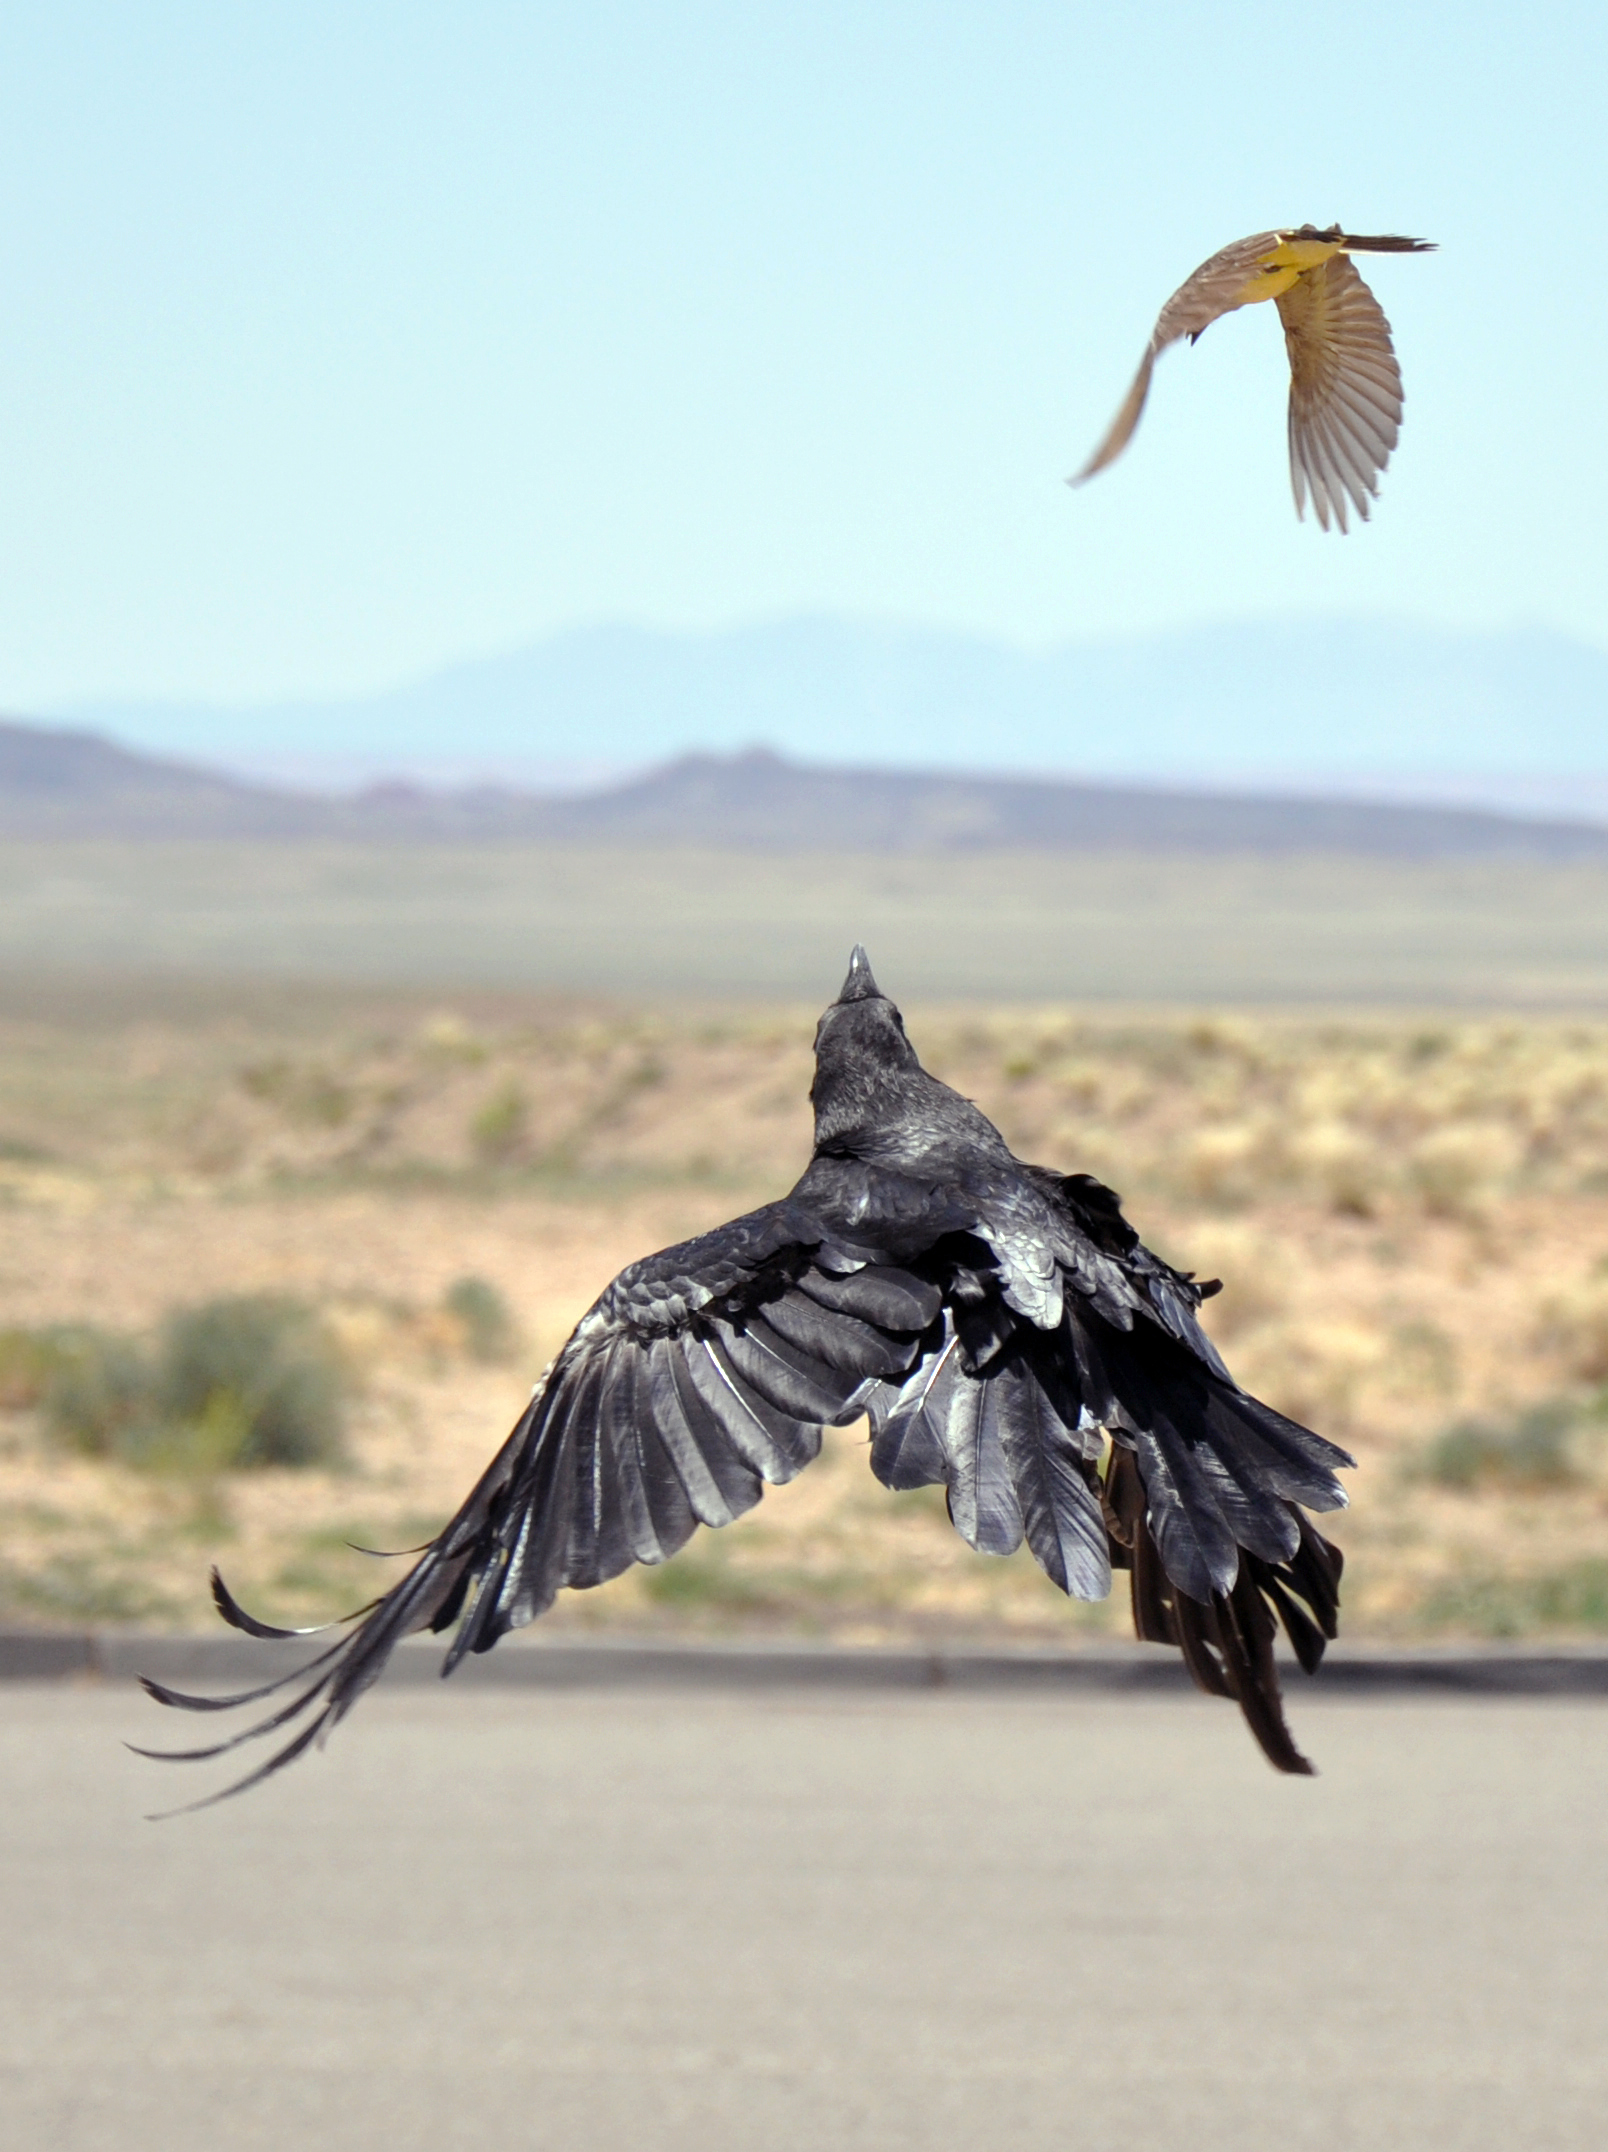 flight by nothakus